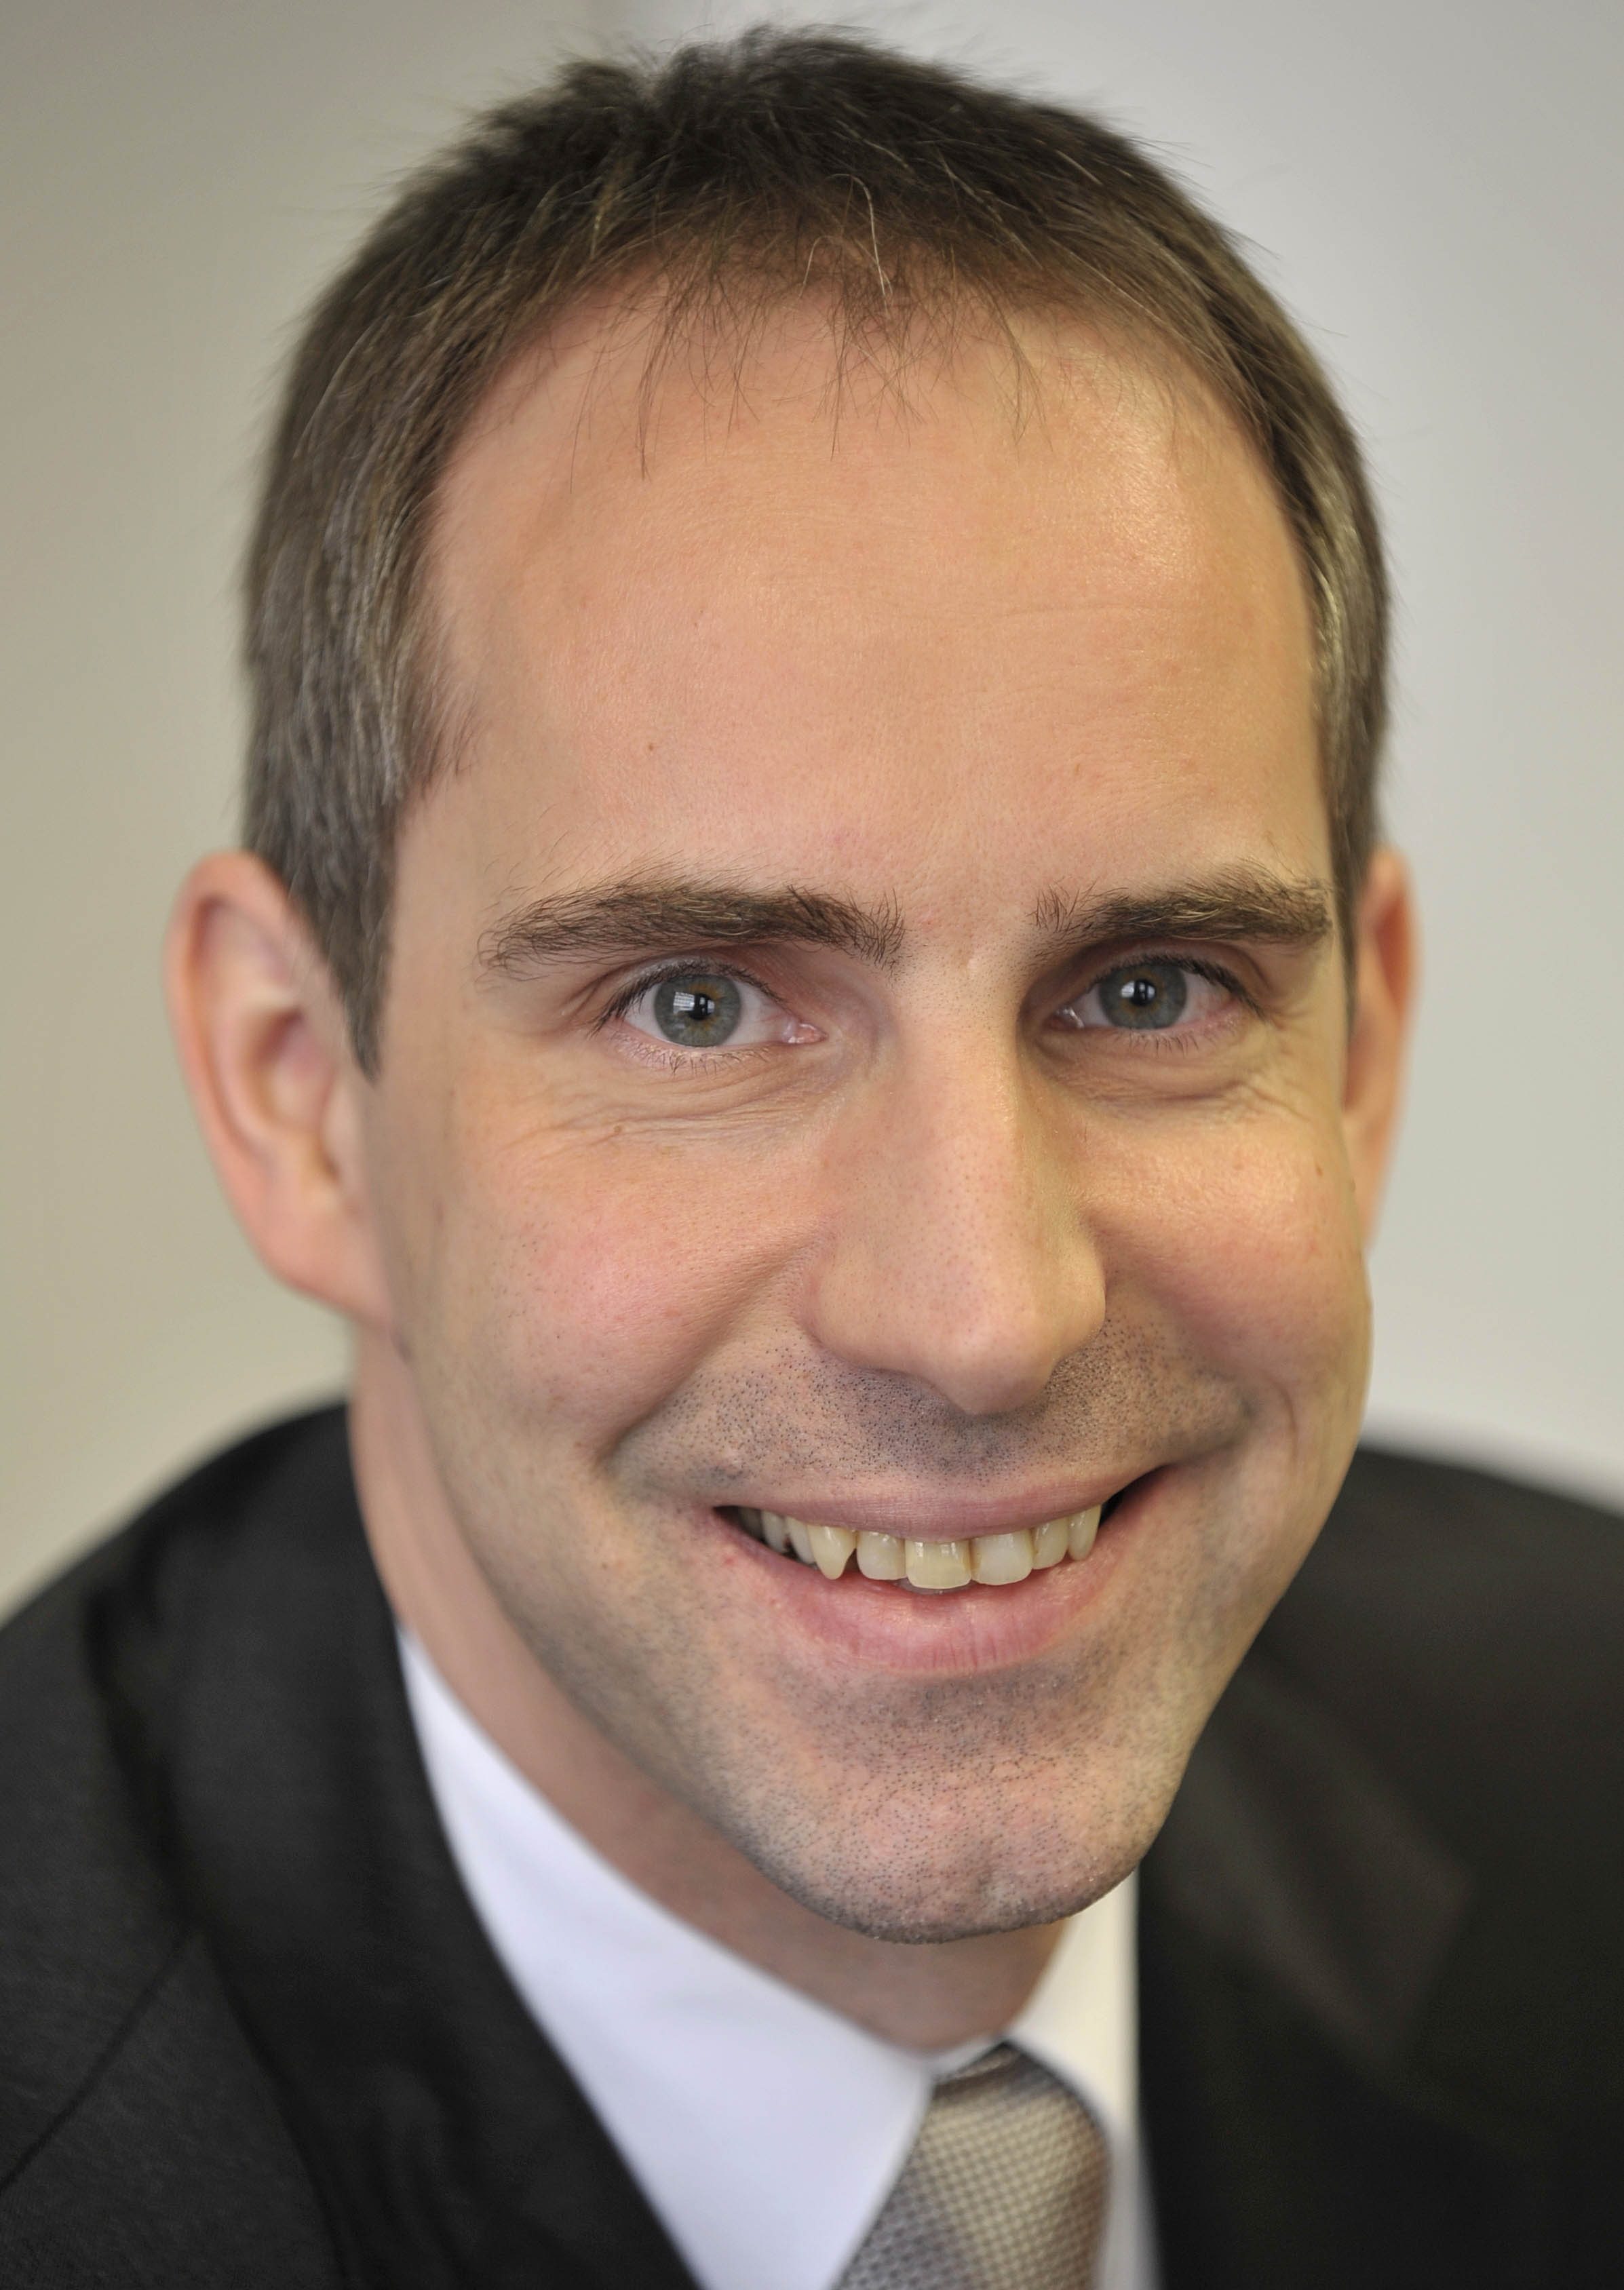 PD Dr. med. Harald Scherk